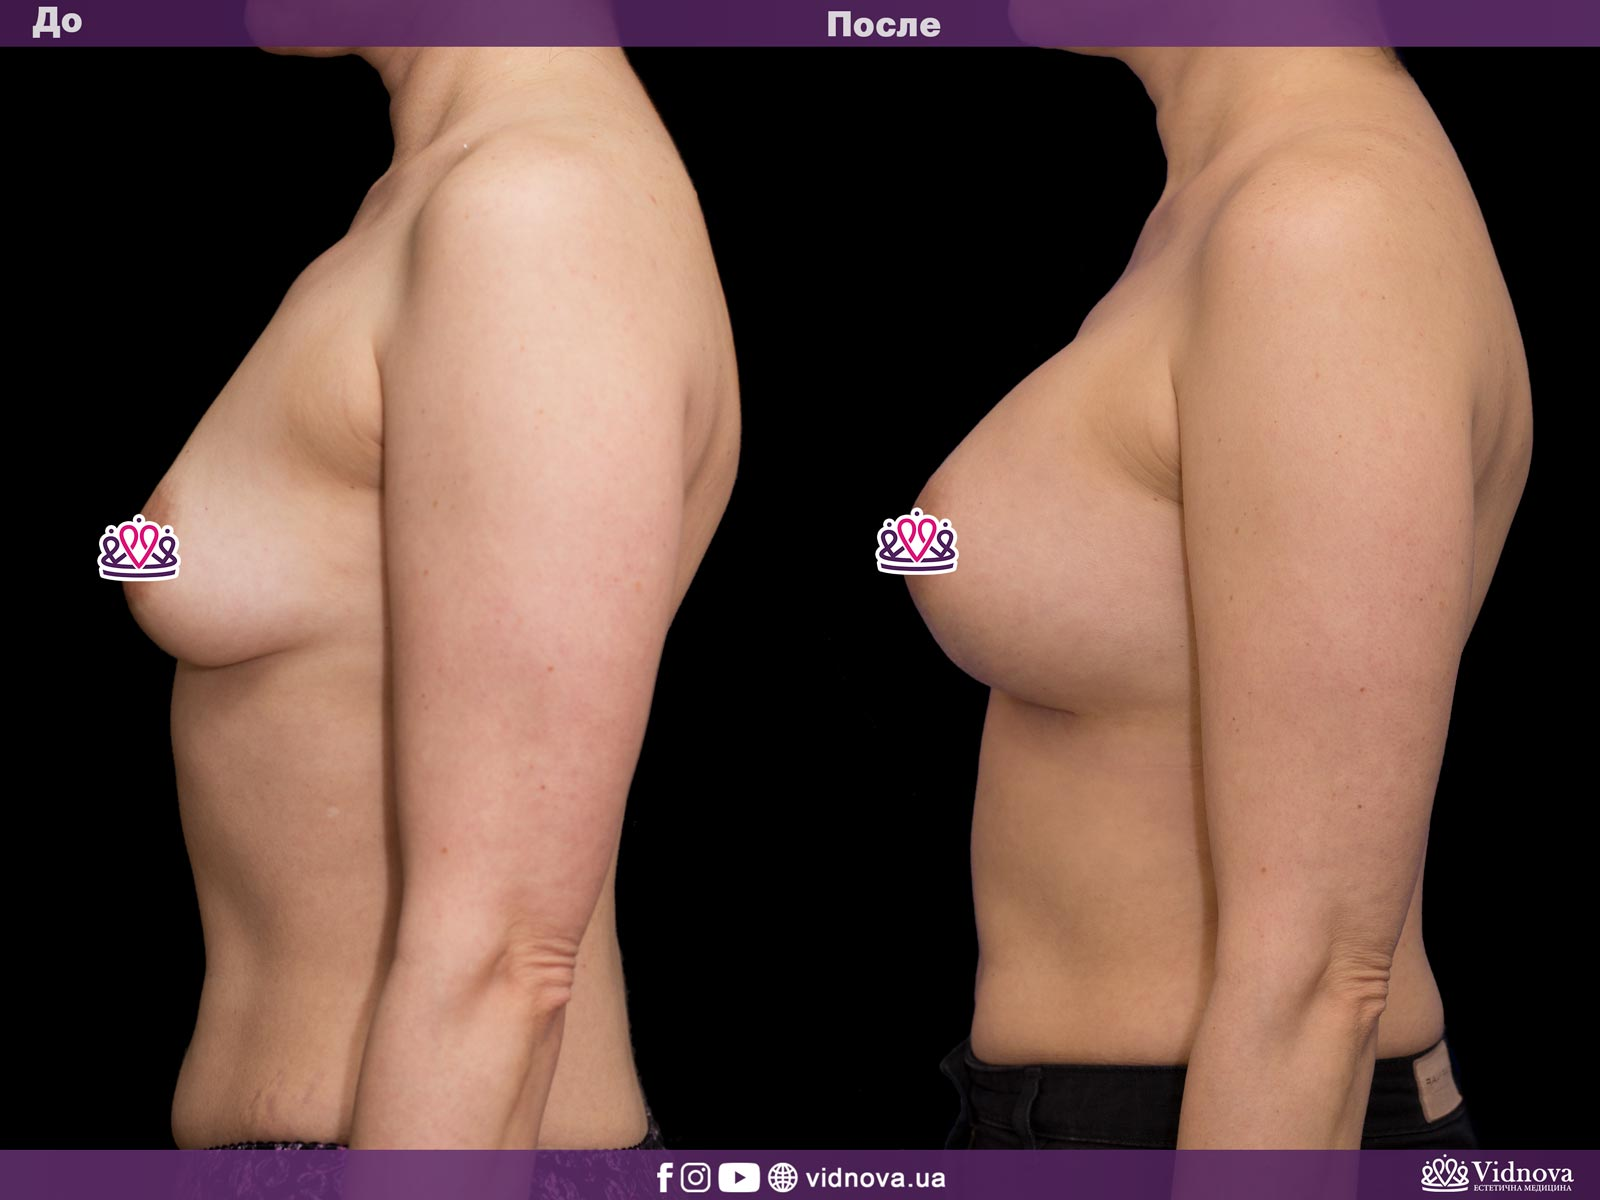 Увеличение груди: Фото ДО и ПОСЛЕ - Пример №36-3 - Клиника Vidnova